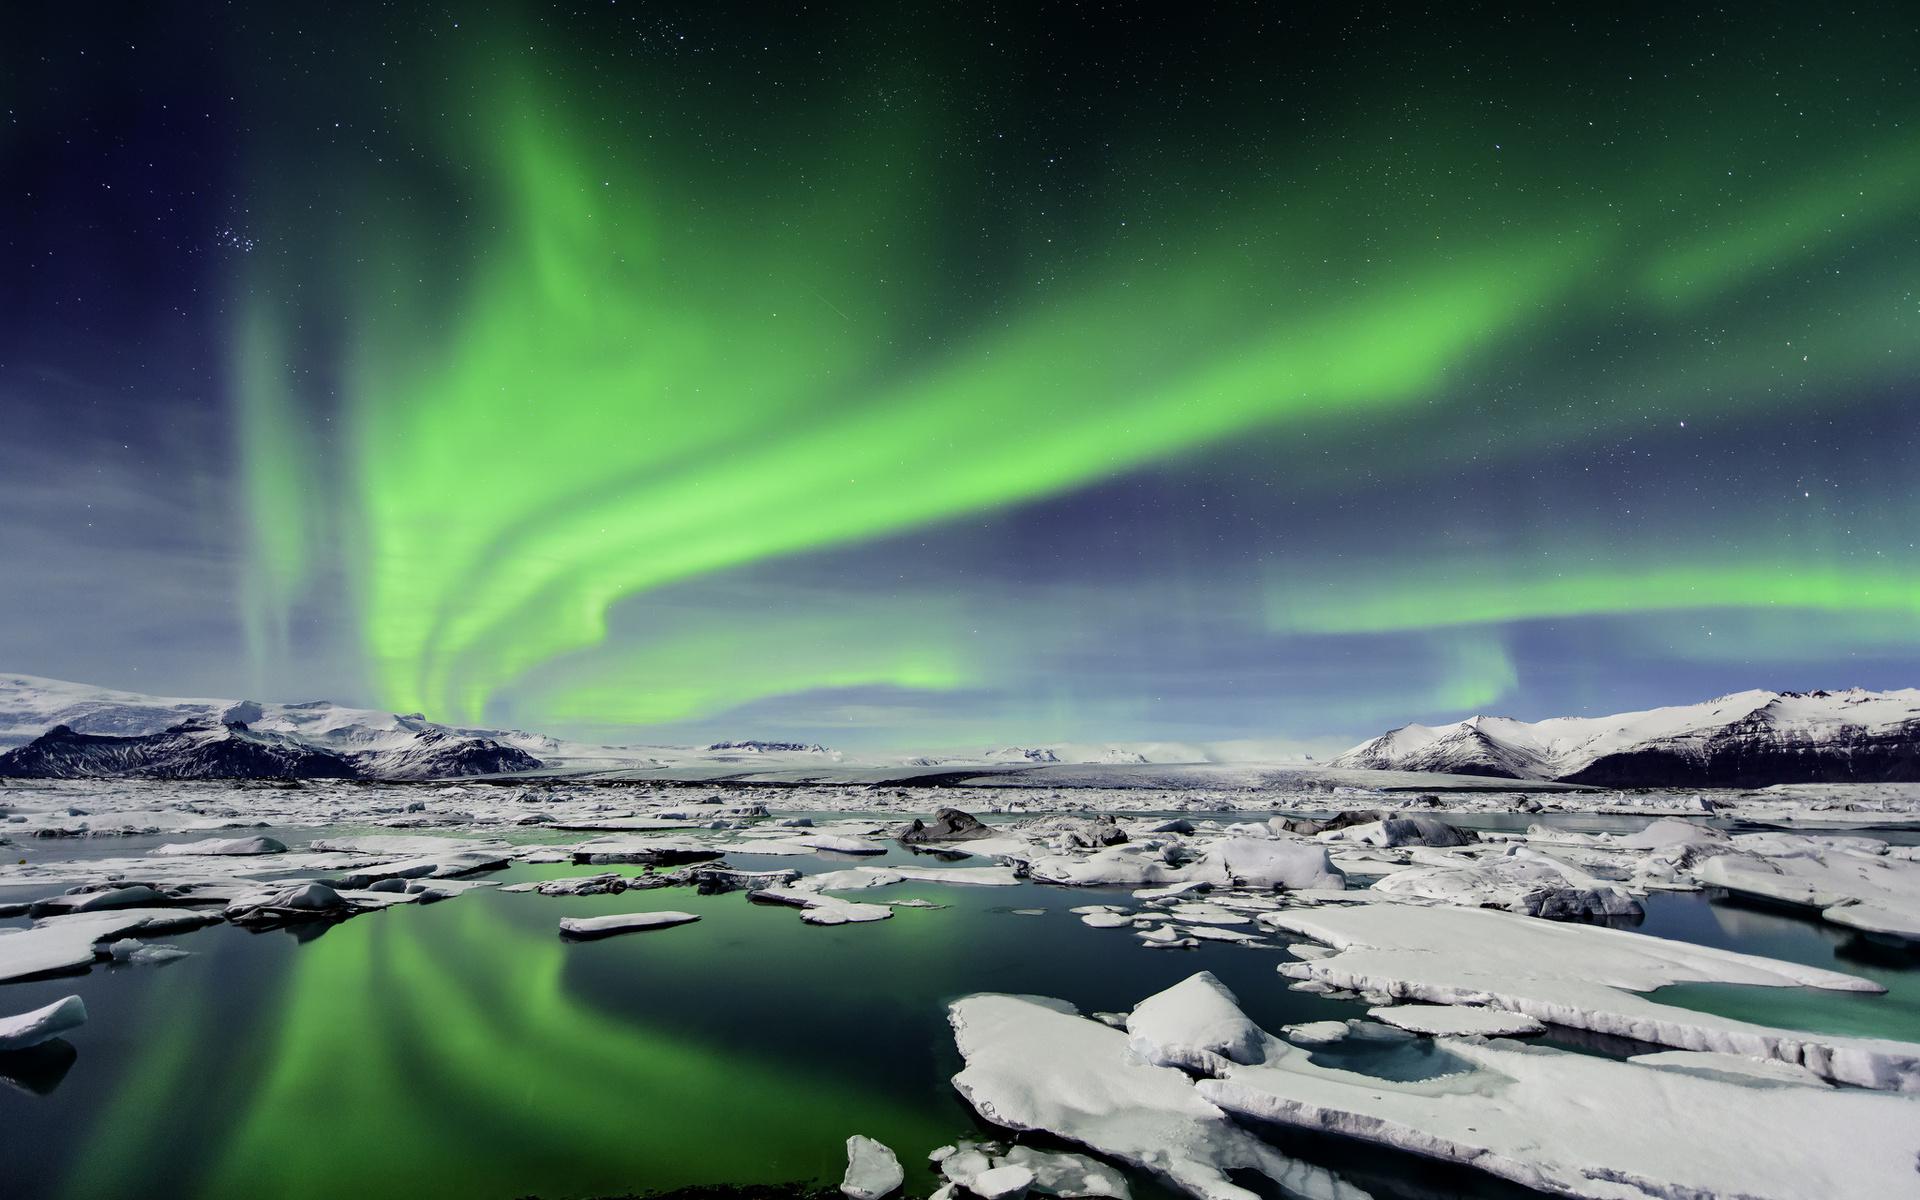 48 Most Popular Wallpapers For Desktop On Wallpapersafari: [48+] Iceland Desktop Wallpaper On WallpaperSafari